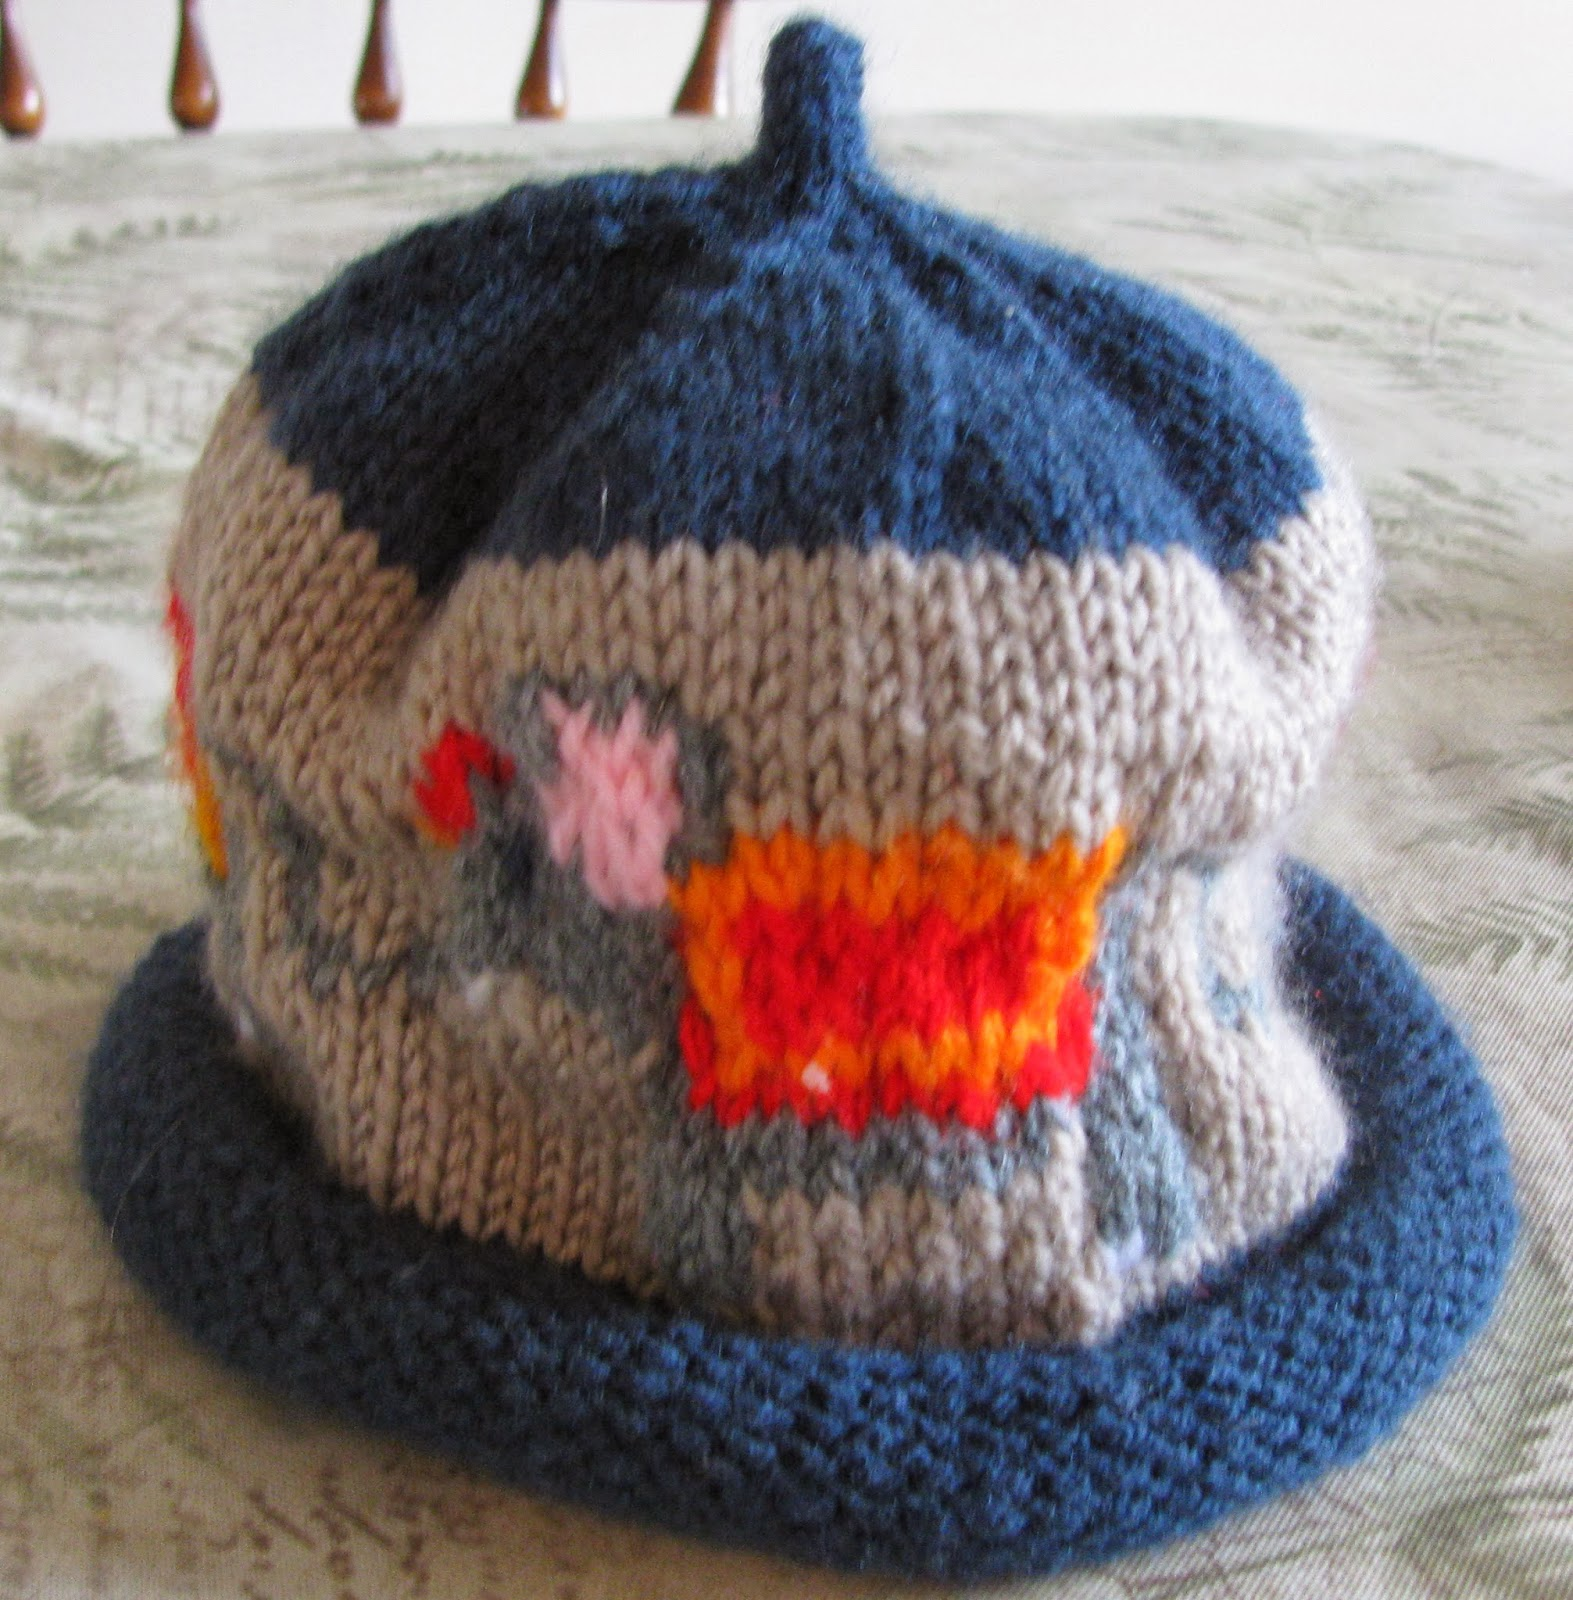 Knitskatoon: A retrospective of baby hats